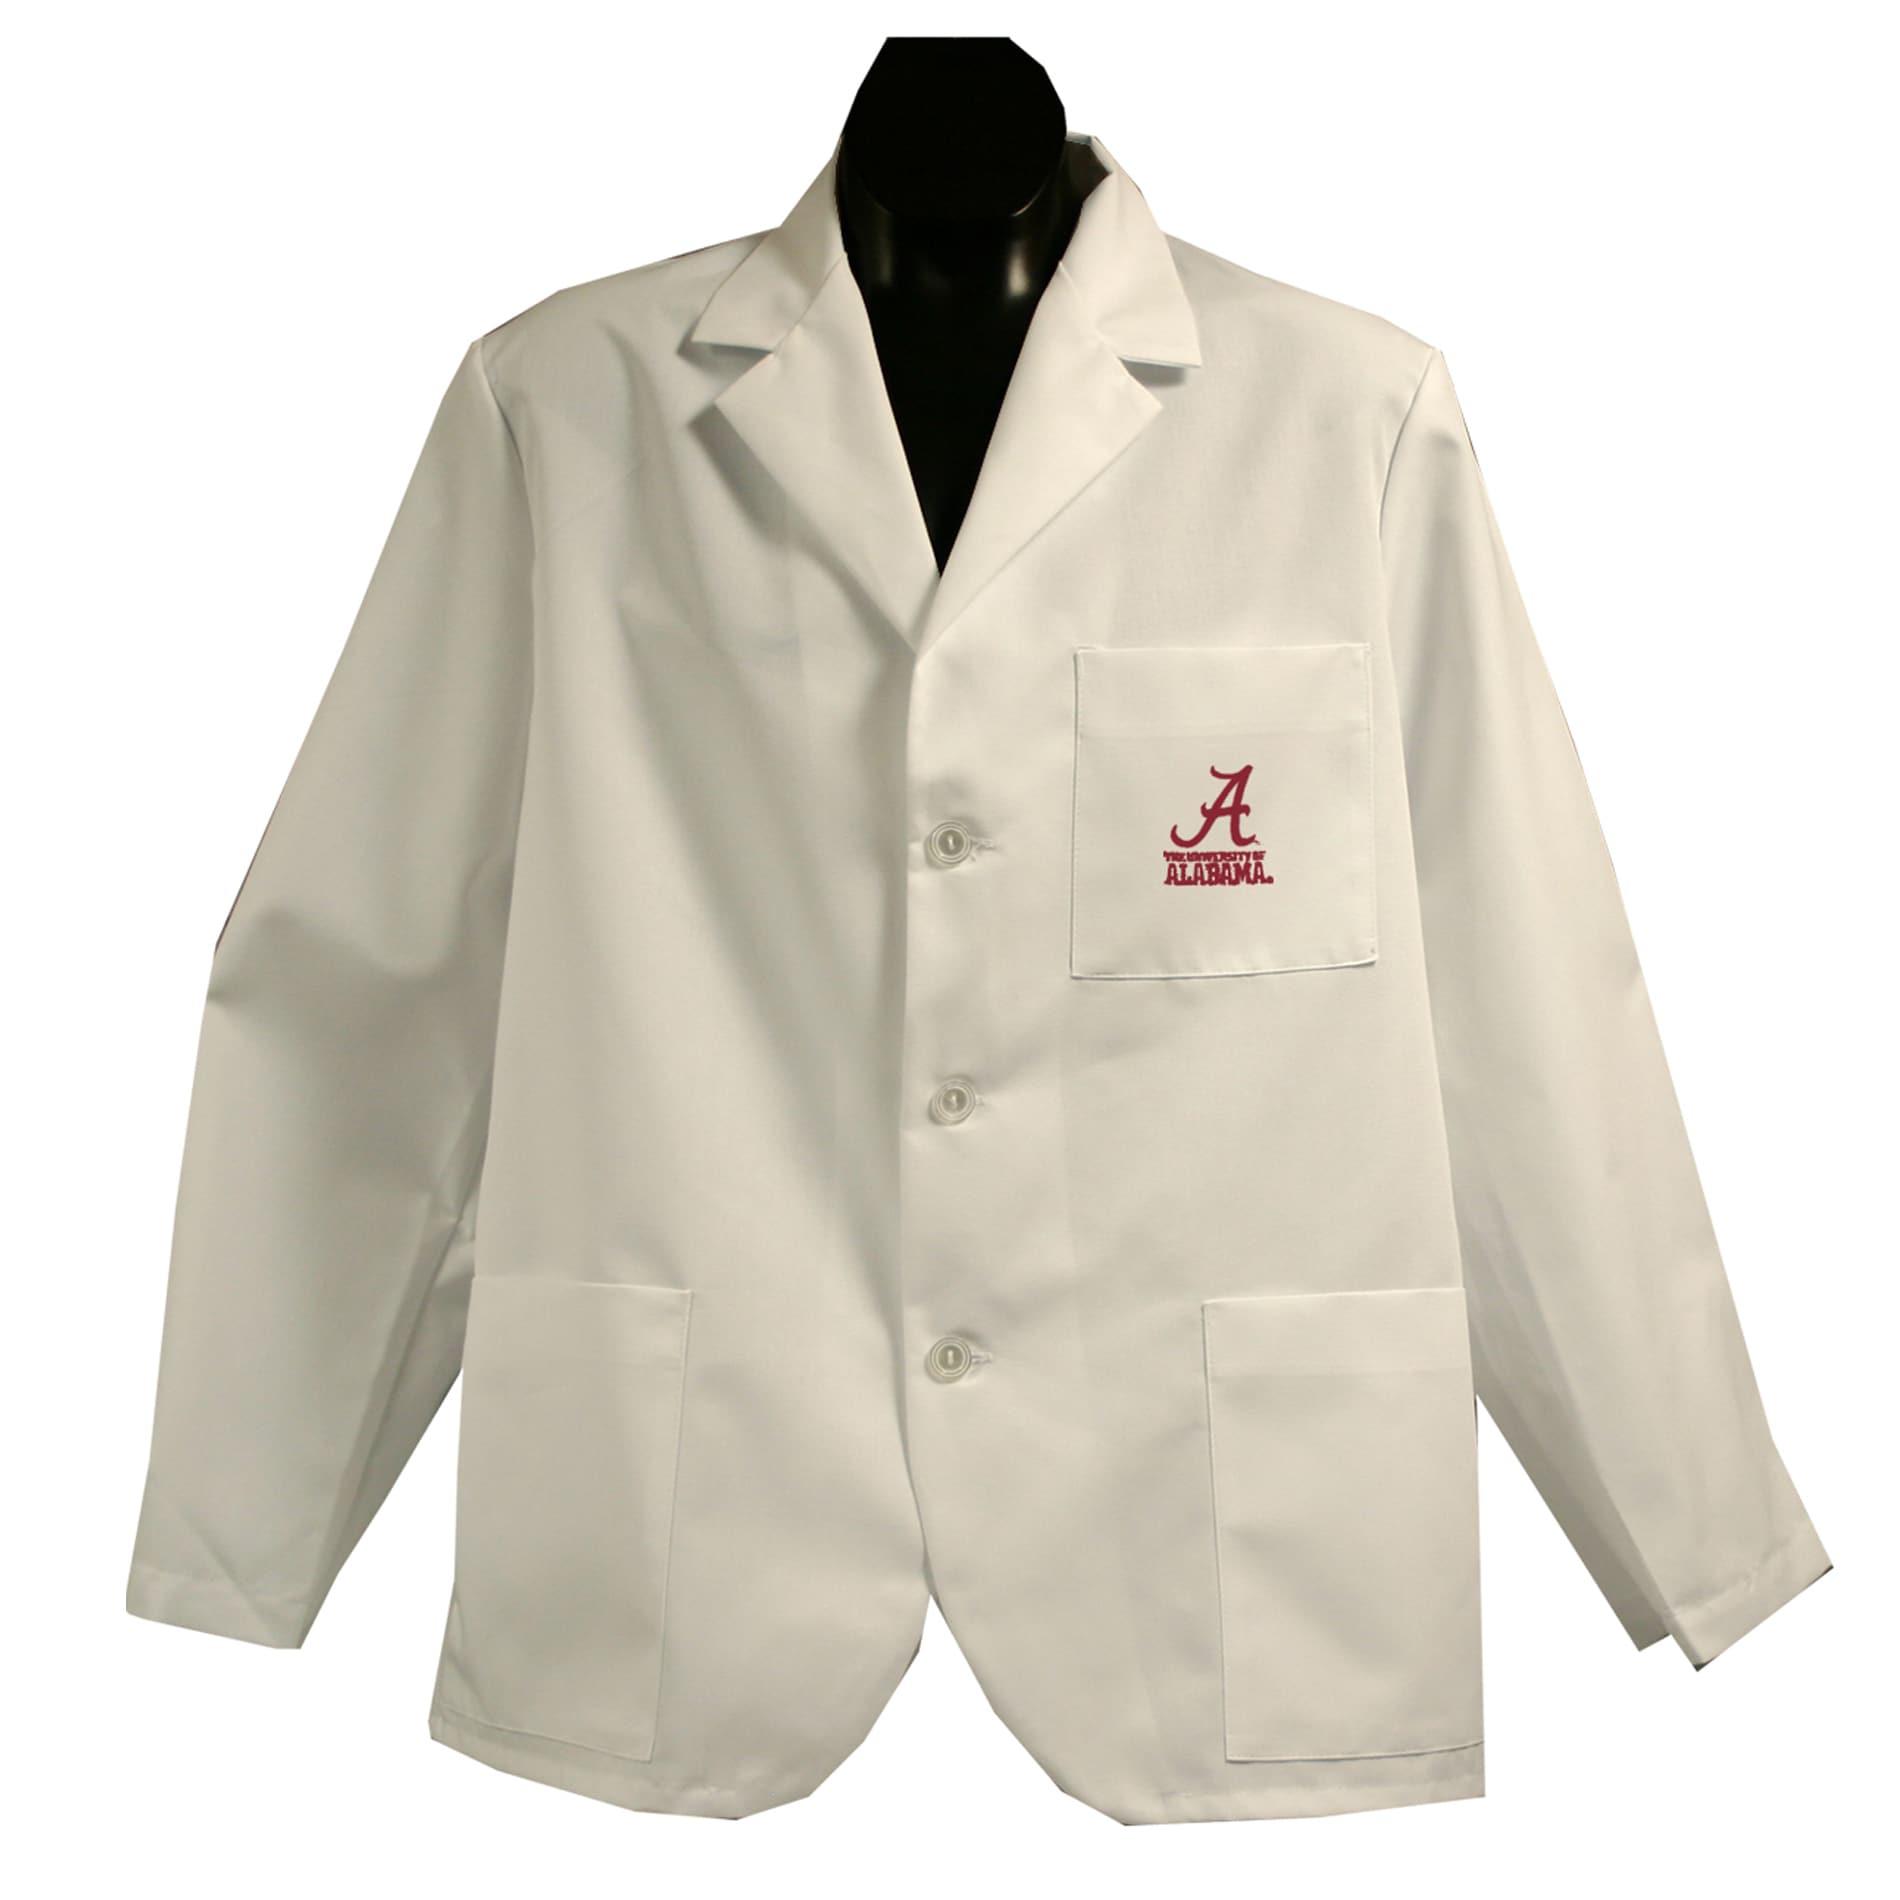 Gelscrubs Machine-Washable Unisex NCAA Alabama Crimson Tide Short Labcoat